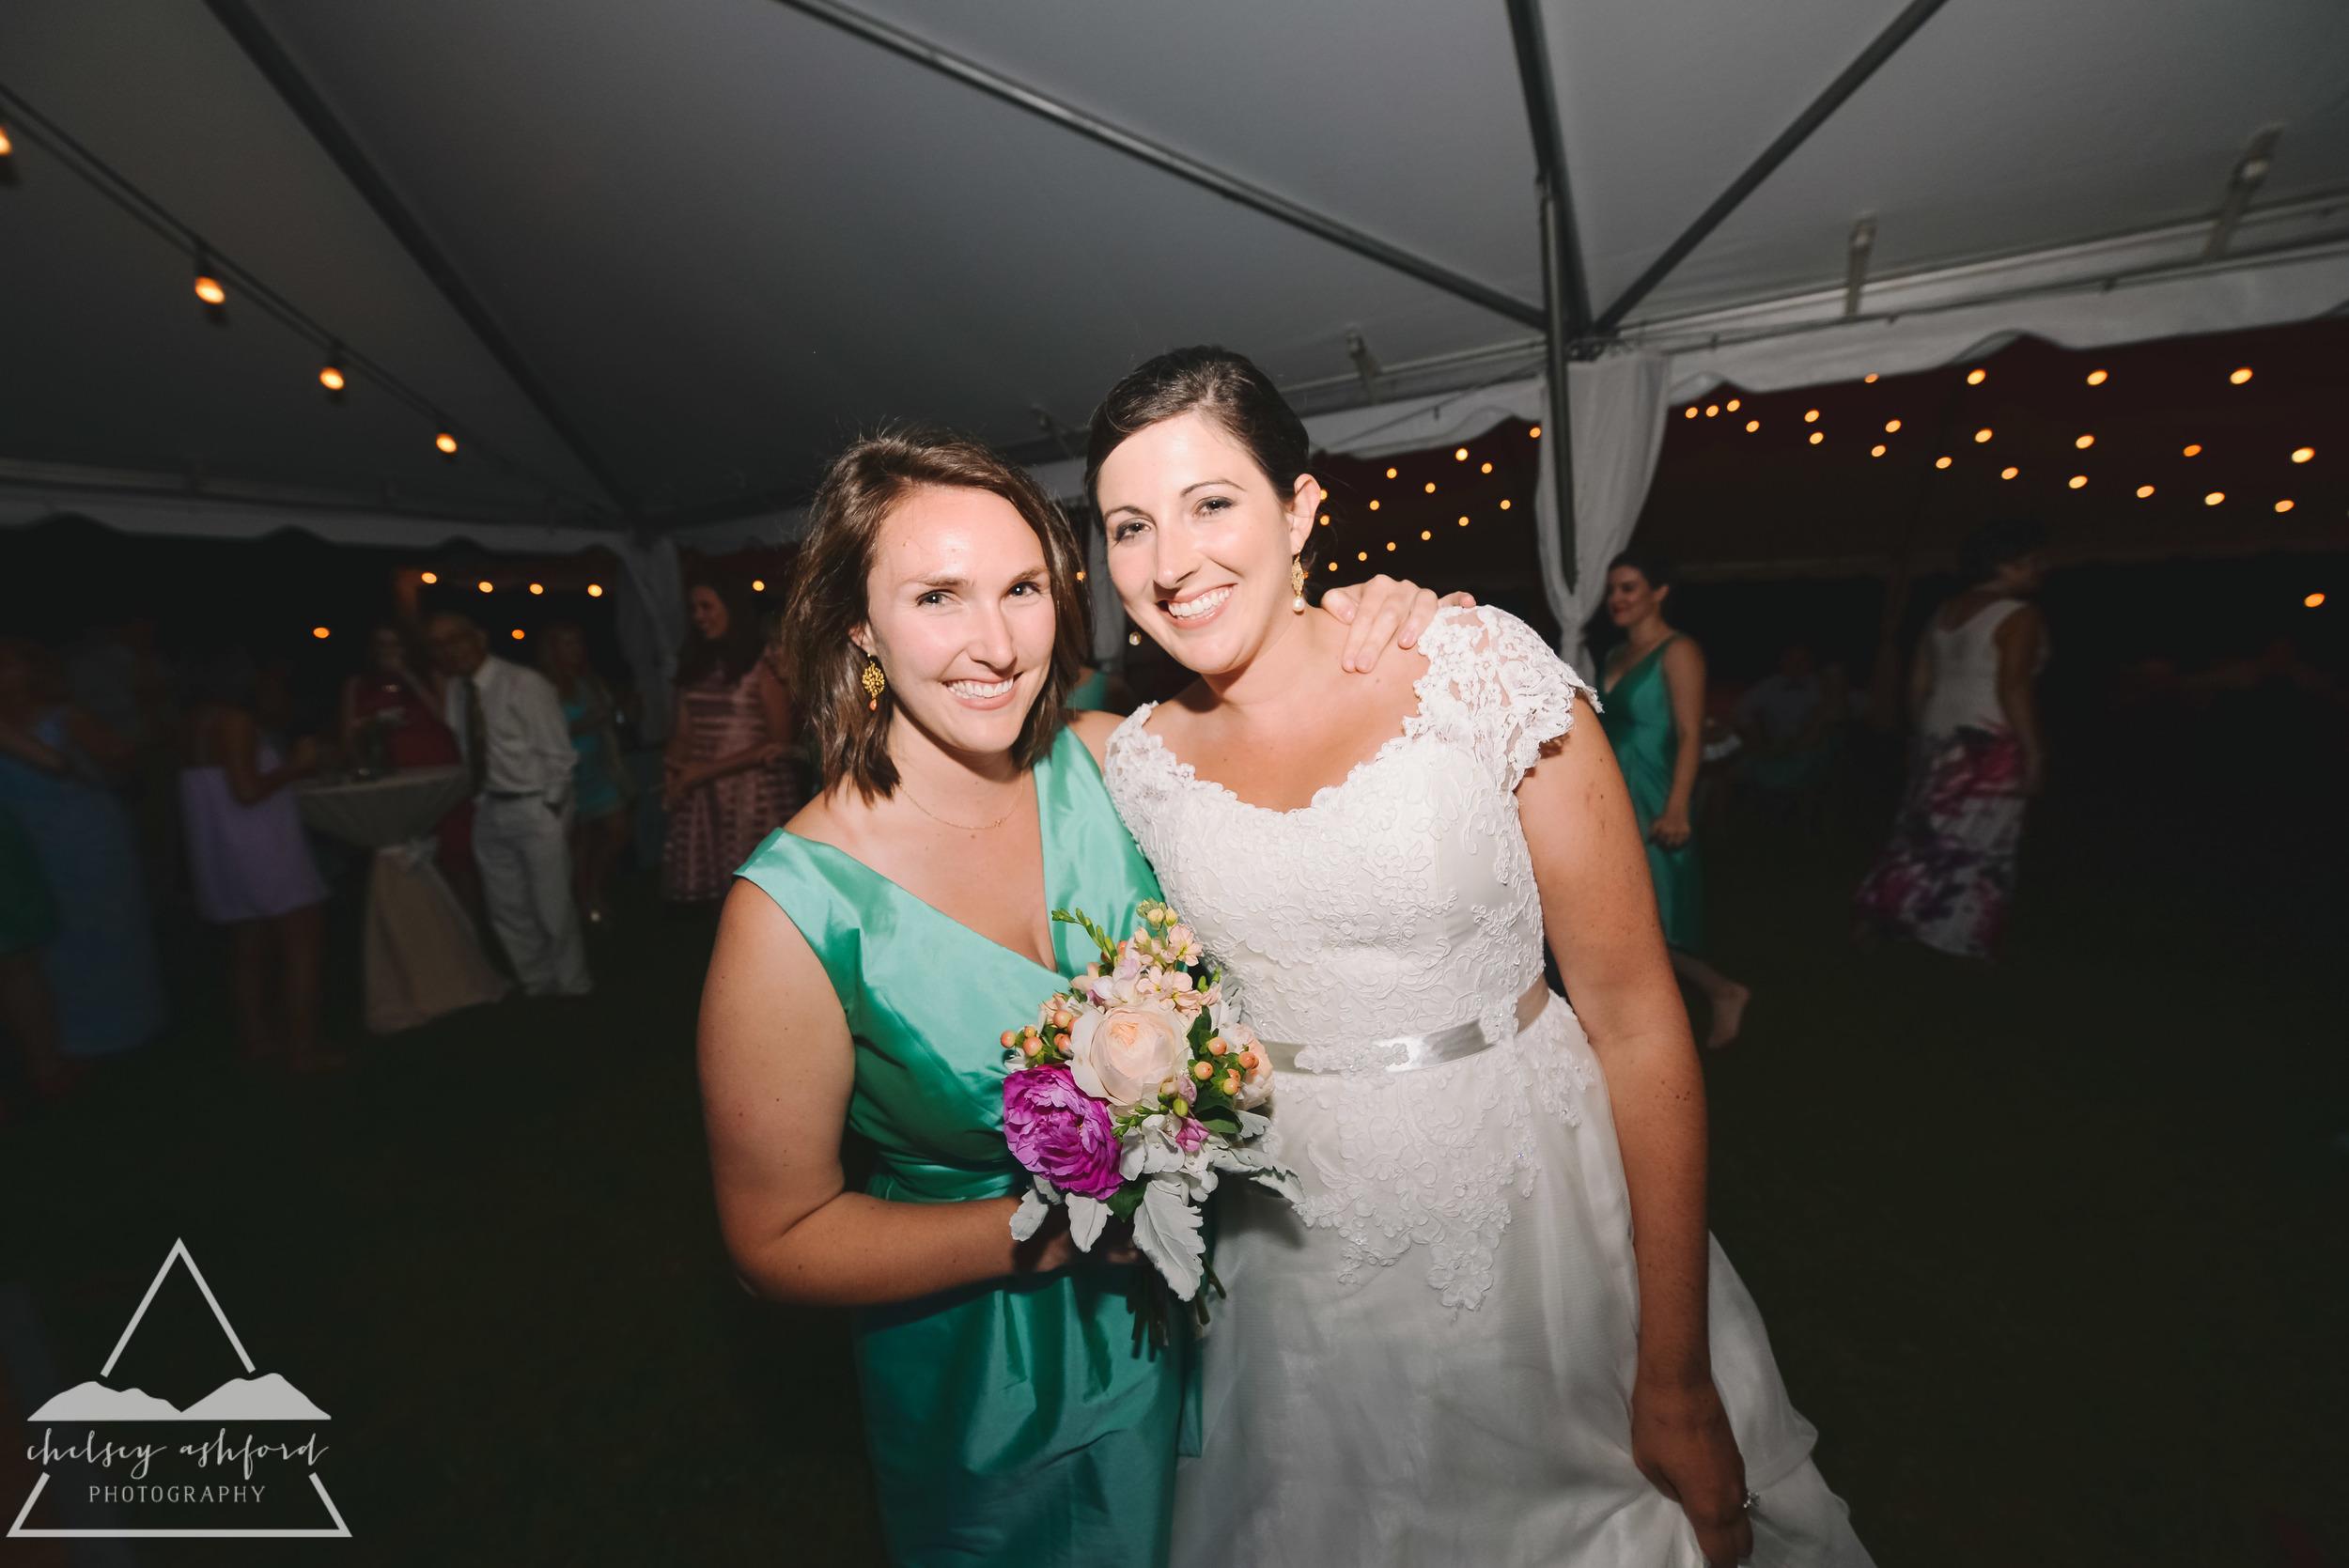 Clarkson_wedding_web-187.jpg